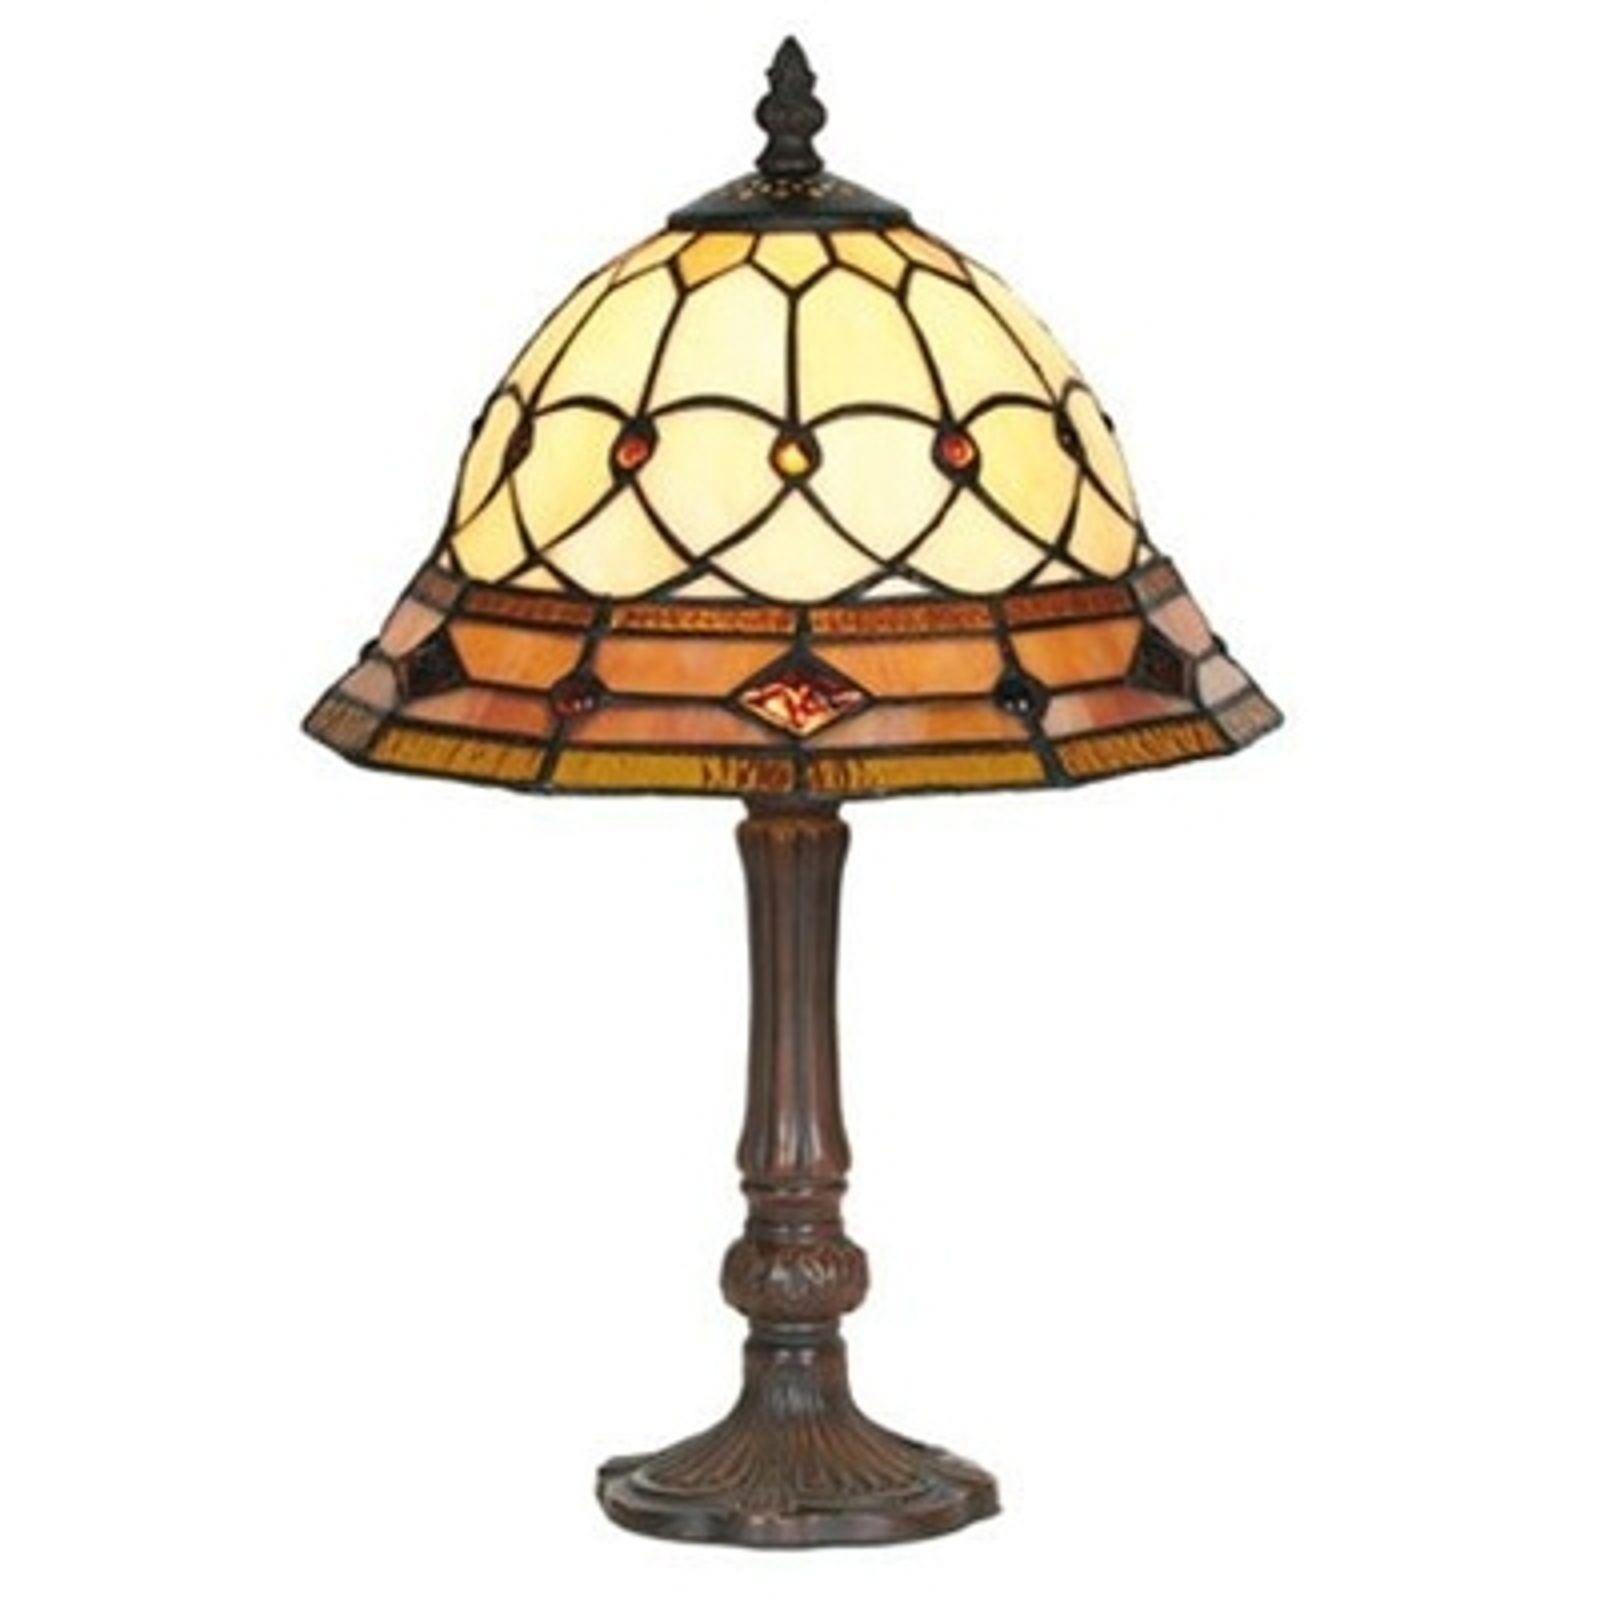 Handmade table lamp KASSANDRA, 42 cm_1032118_1